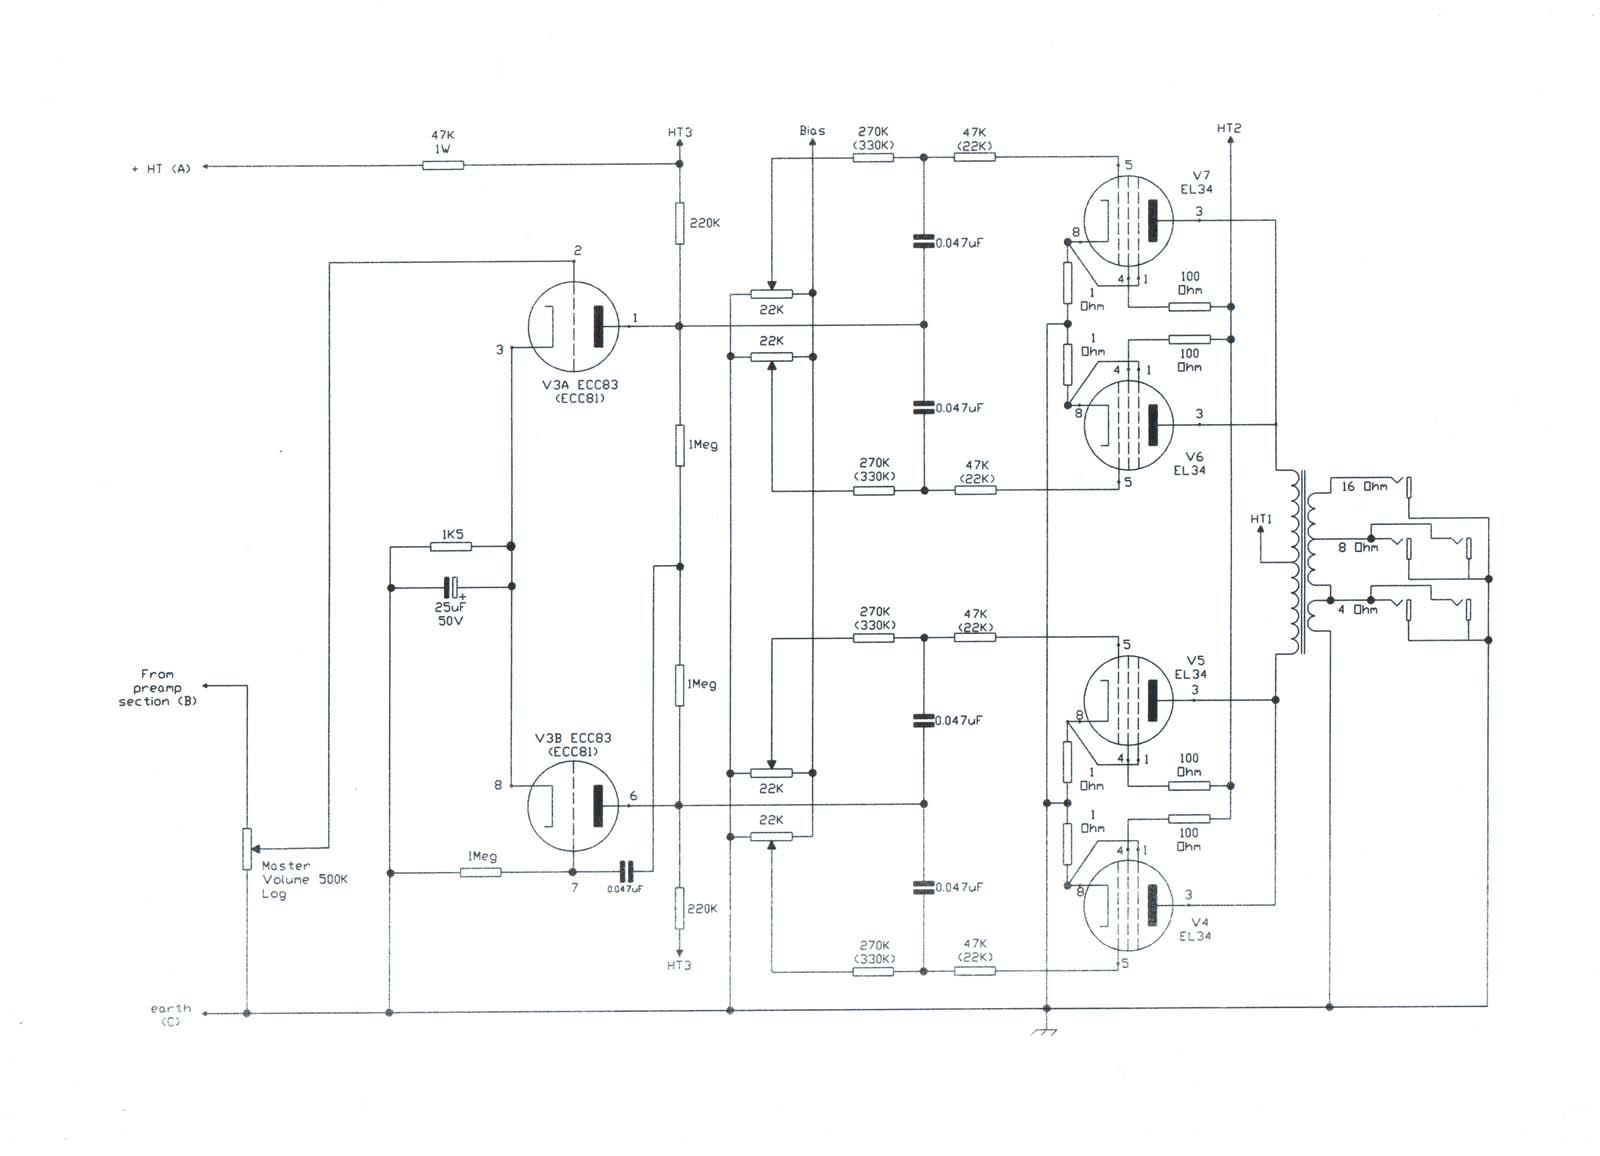 Vampower 100 Watt Mki Amplifier Schematic Diagrams